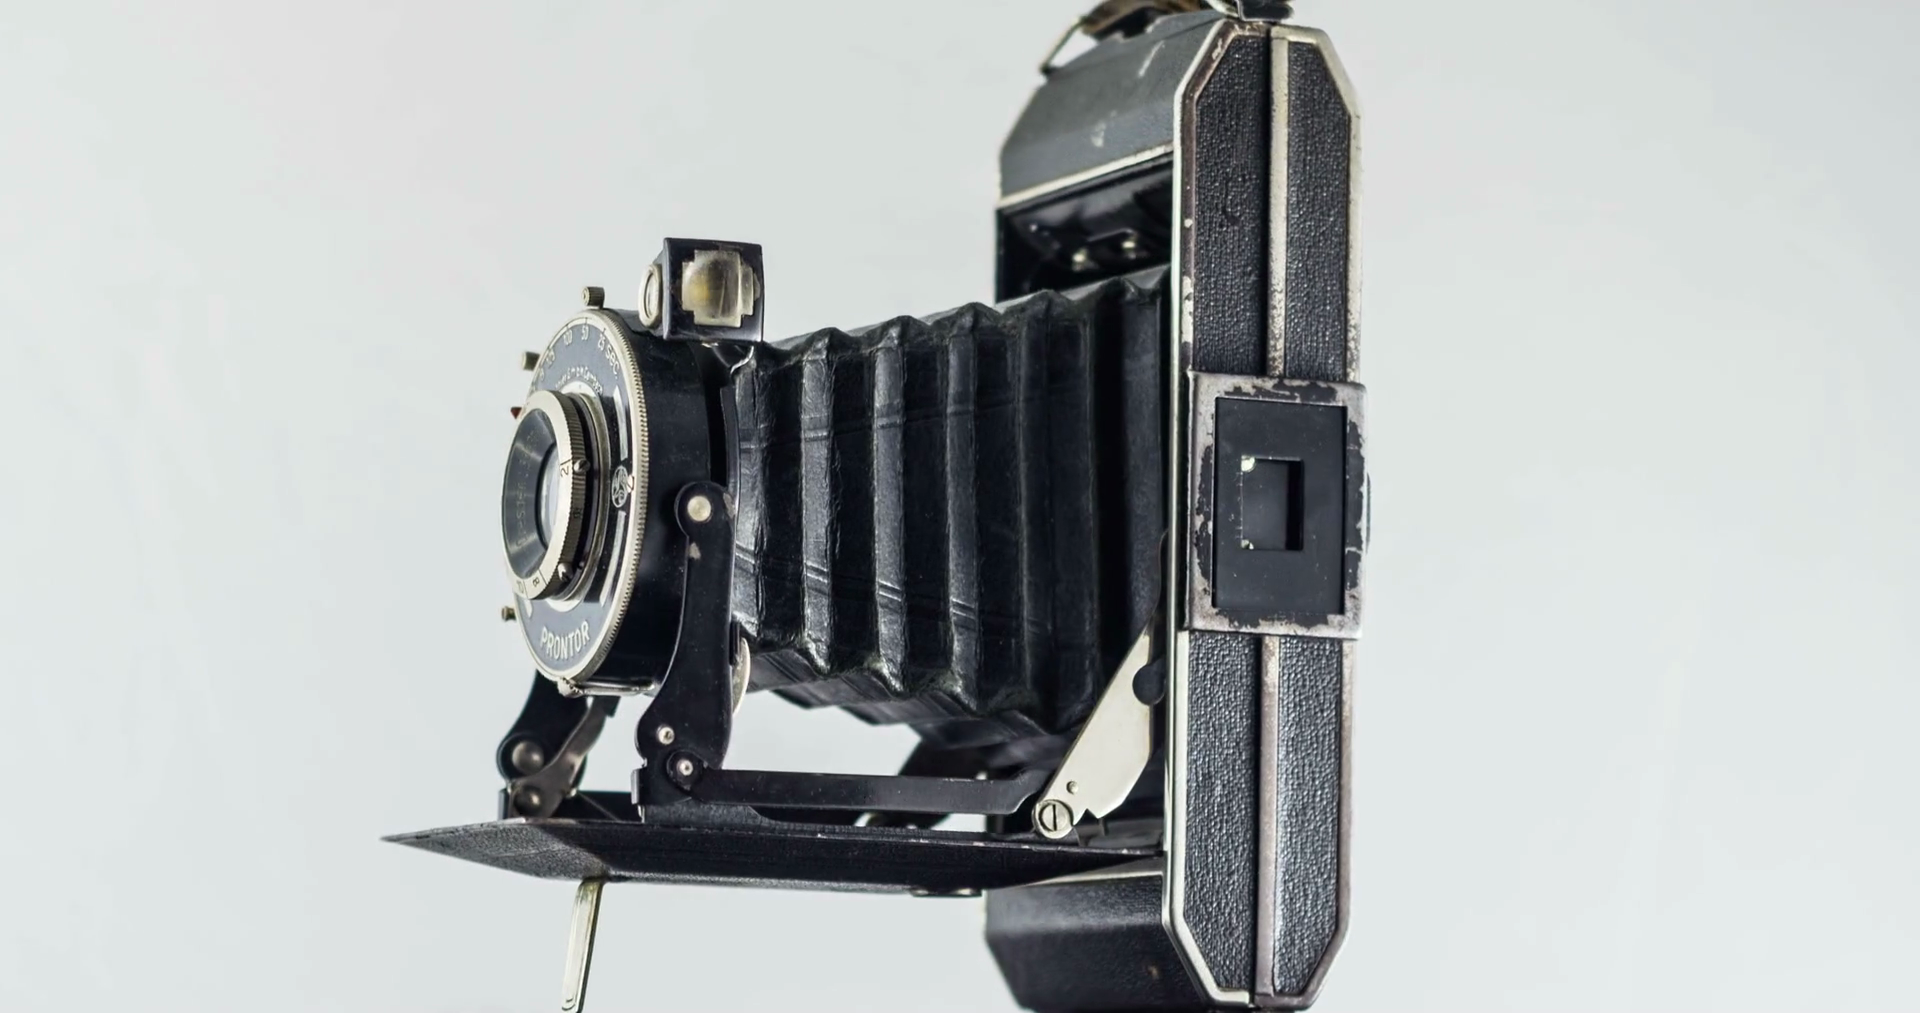 Old Camera Prontor Black Chrome Body Rotating 30 Fps Photojpg Stock ...